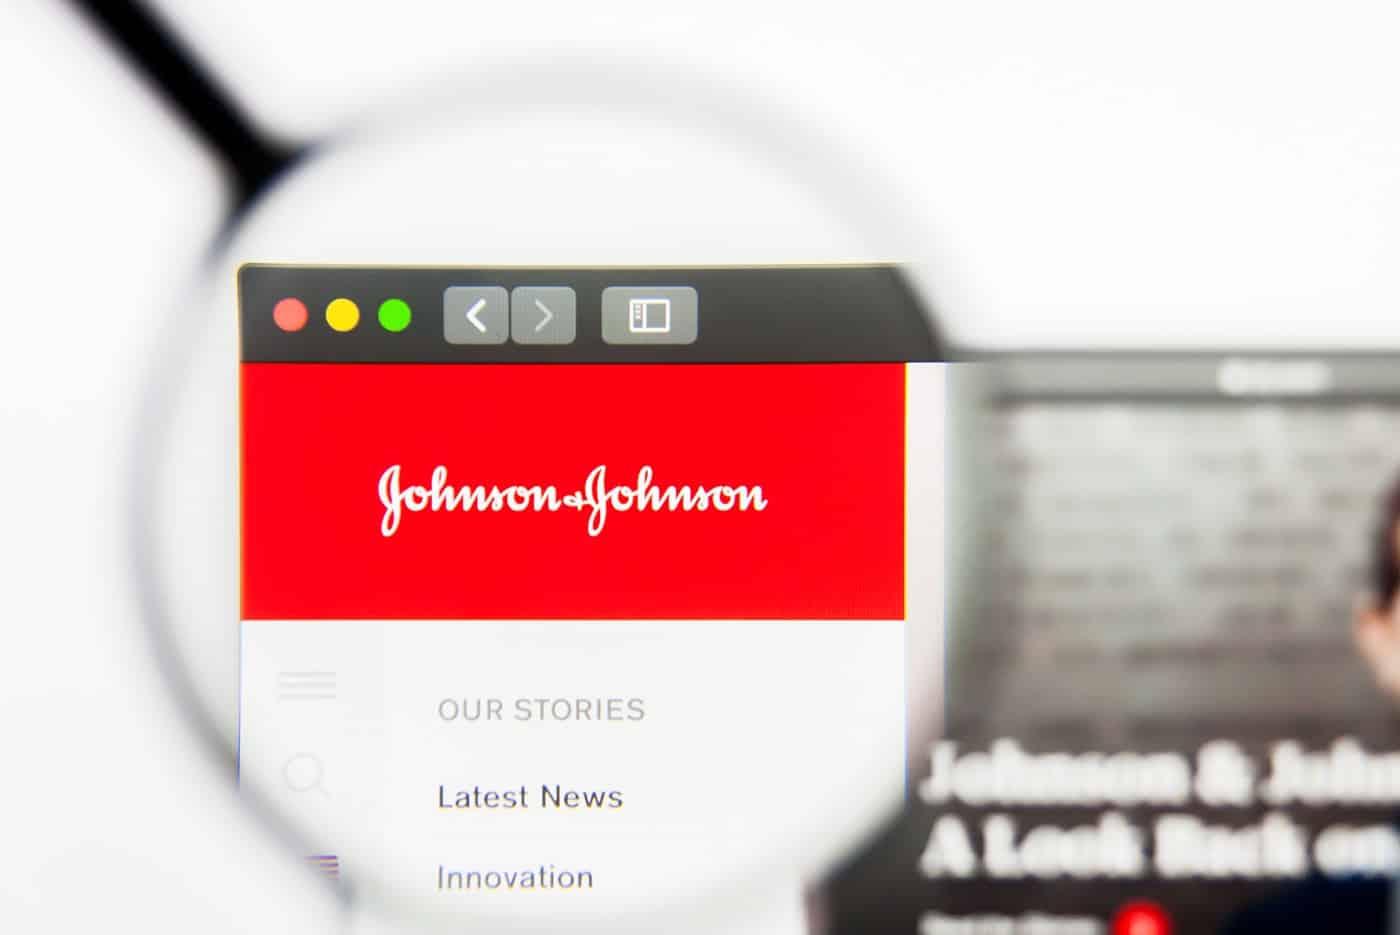 Johnson Amp Johnson Loses Asbestos Talcum Powder Lawsuit